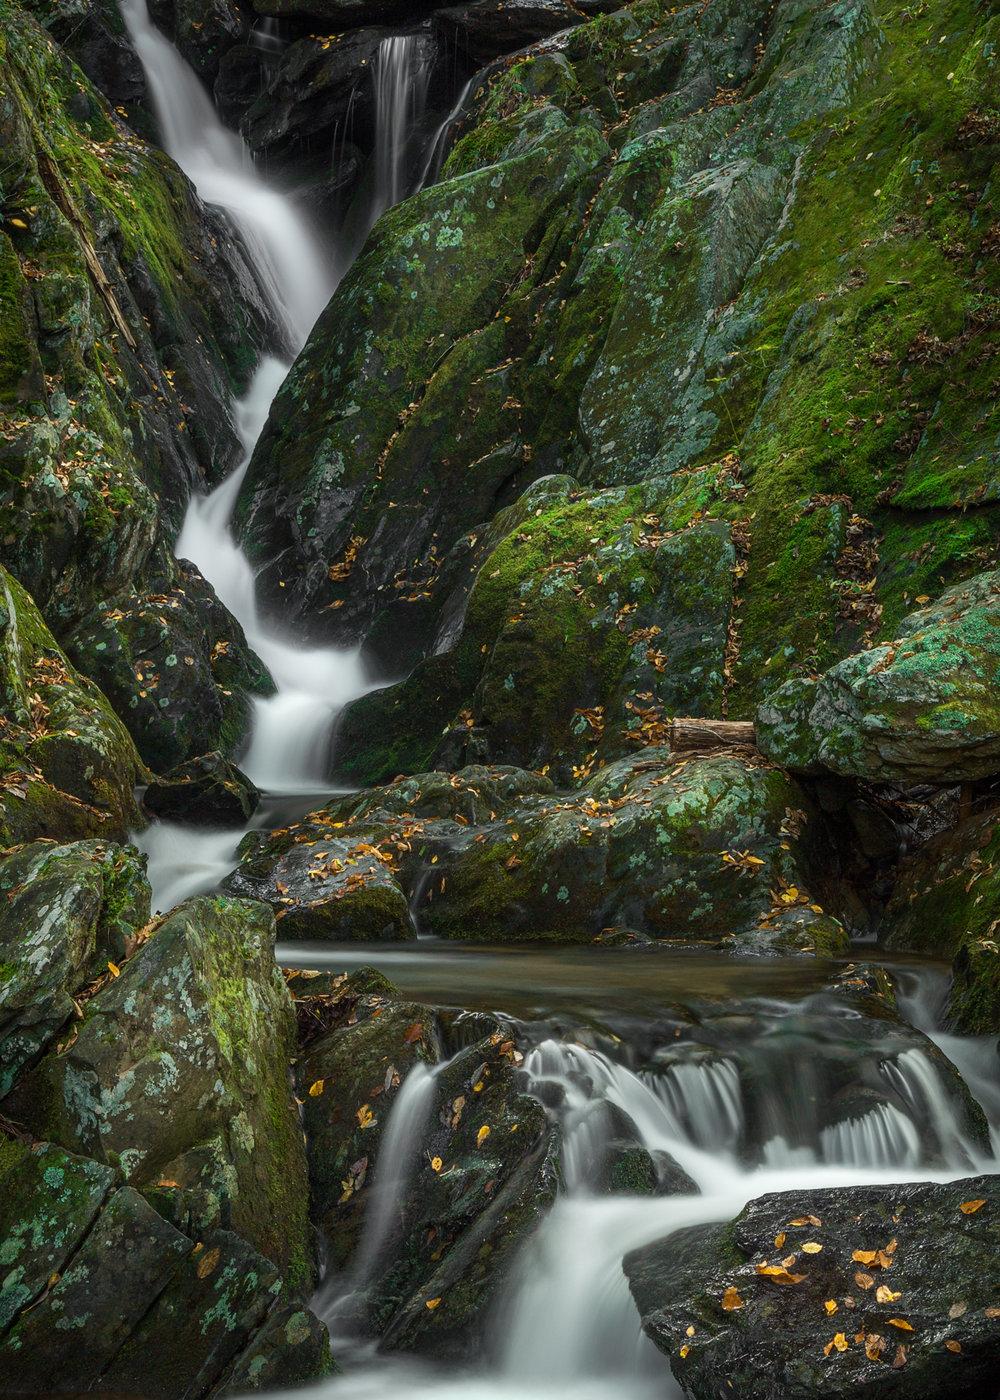 Autumn Waterfall Shenandoah National Park, VA 2018